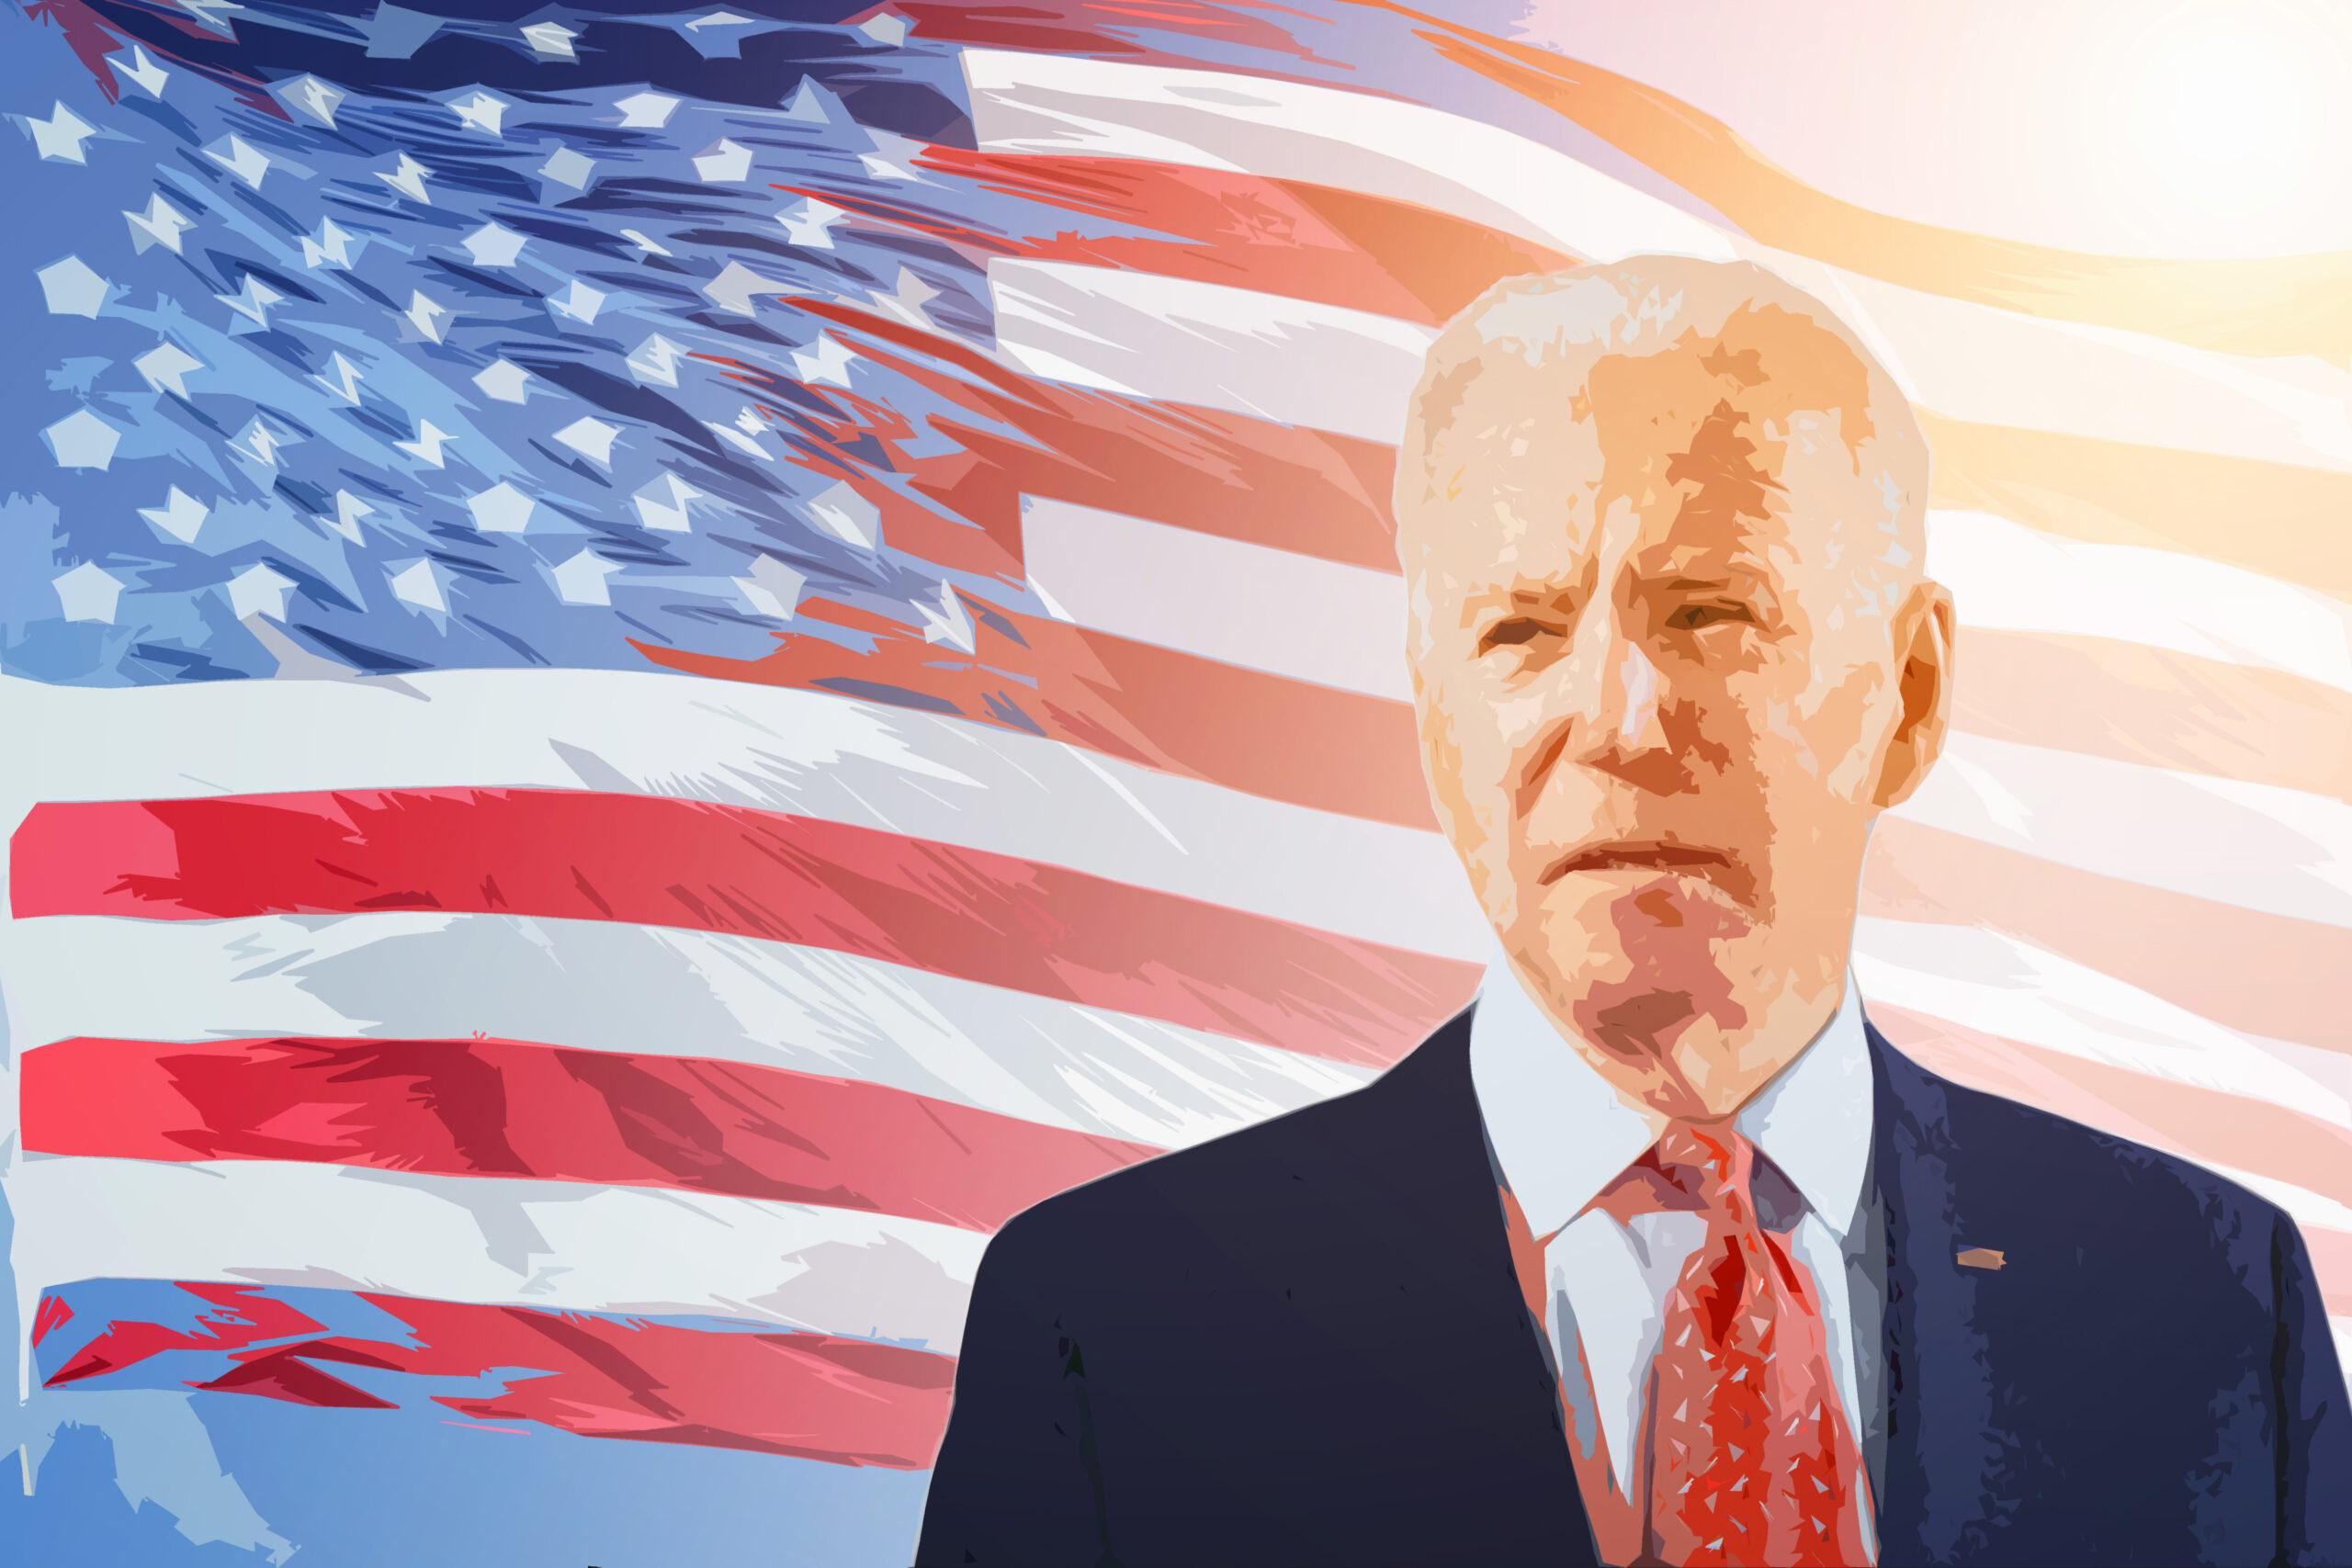 Artistic impression of president elect Joe Biden infront of the US flag